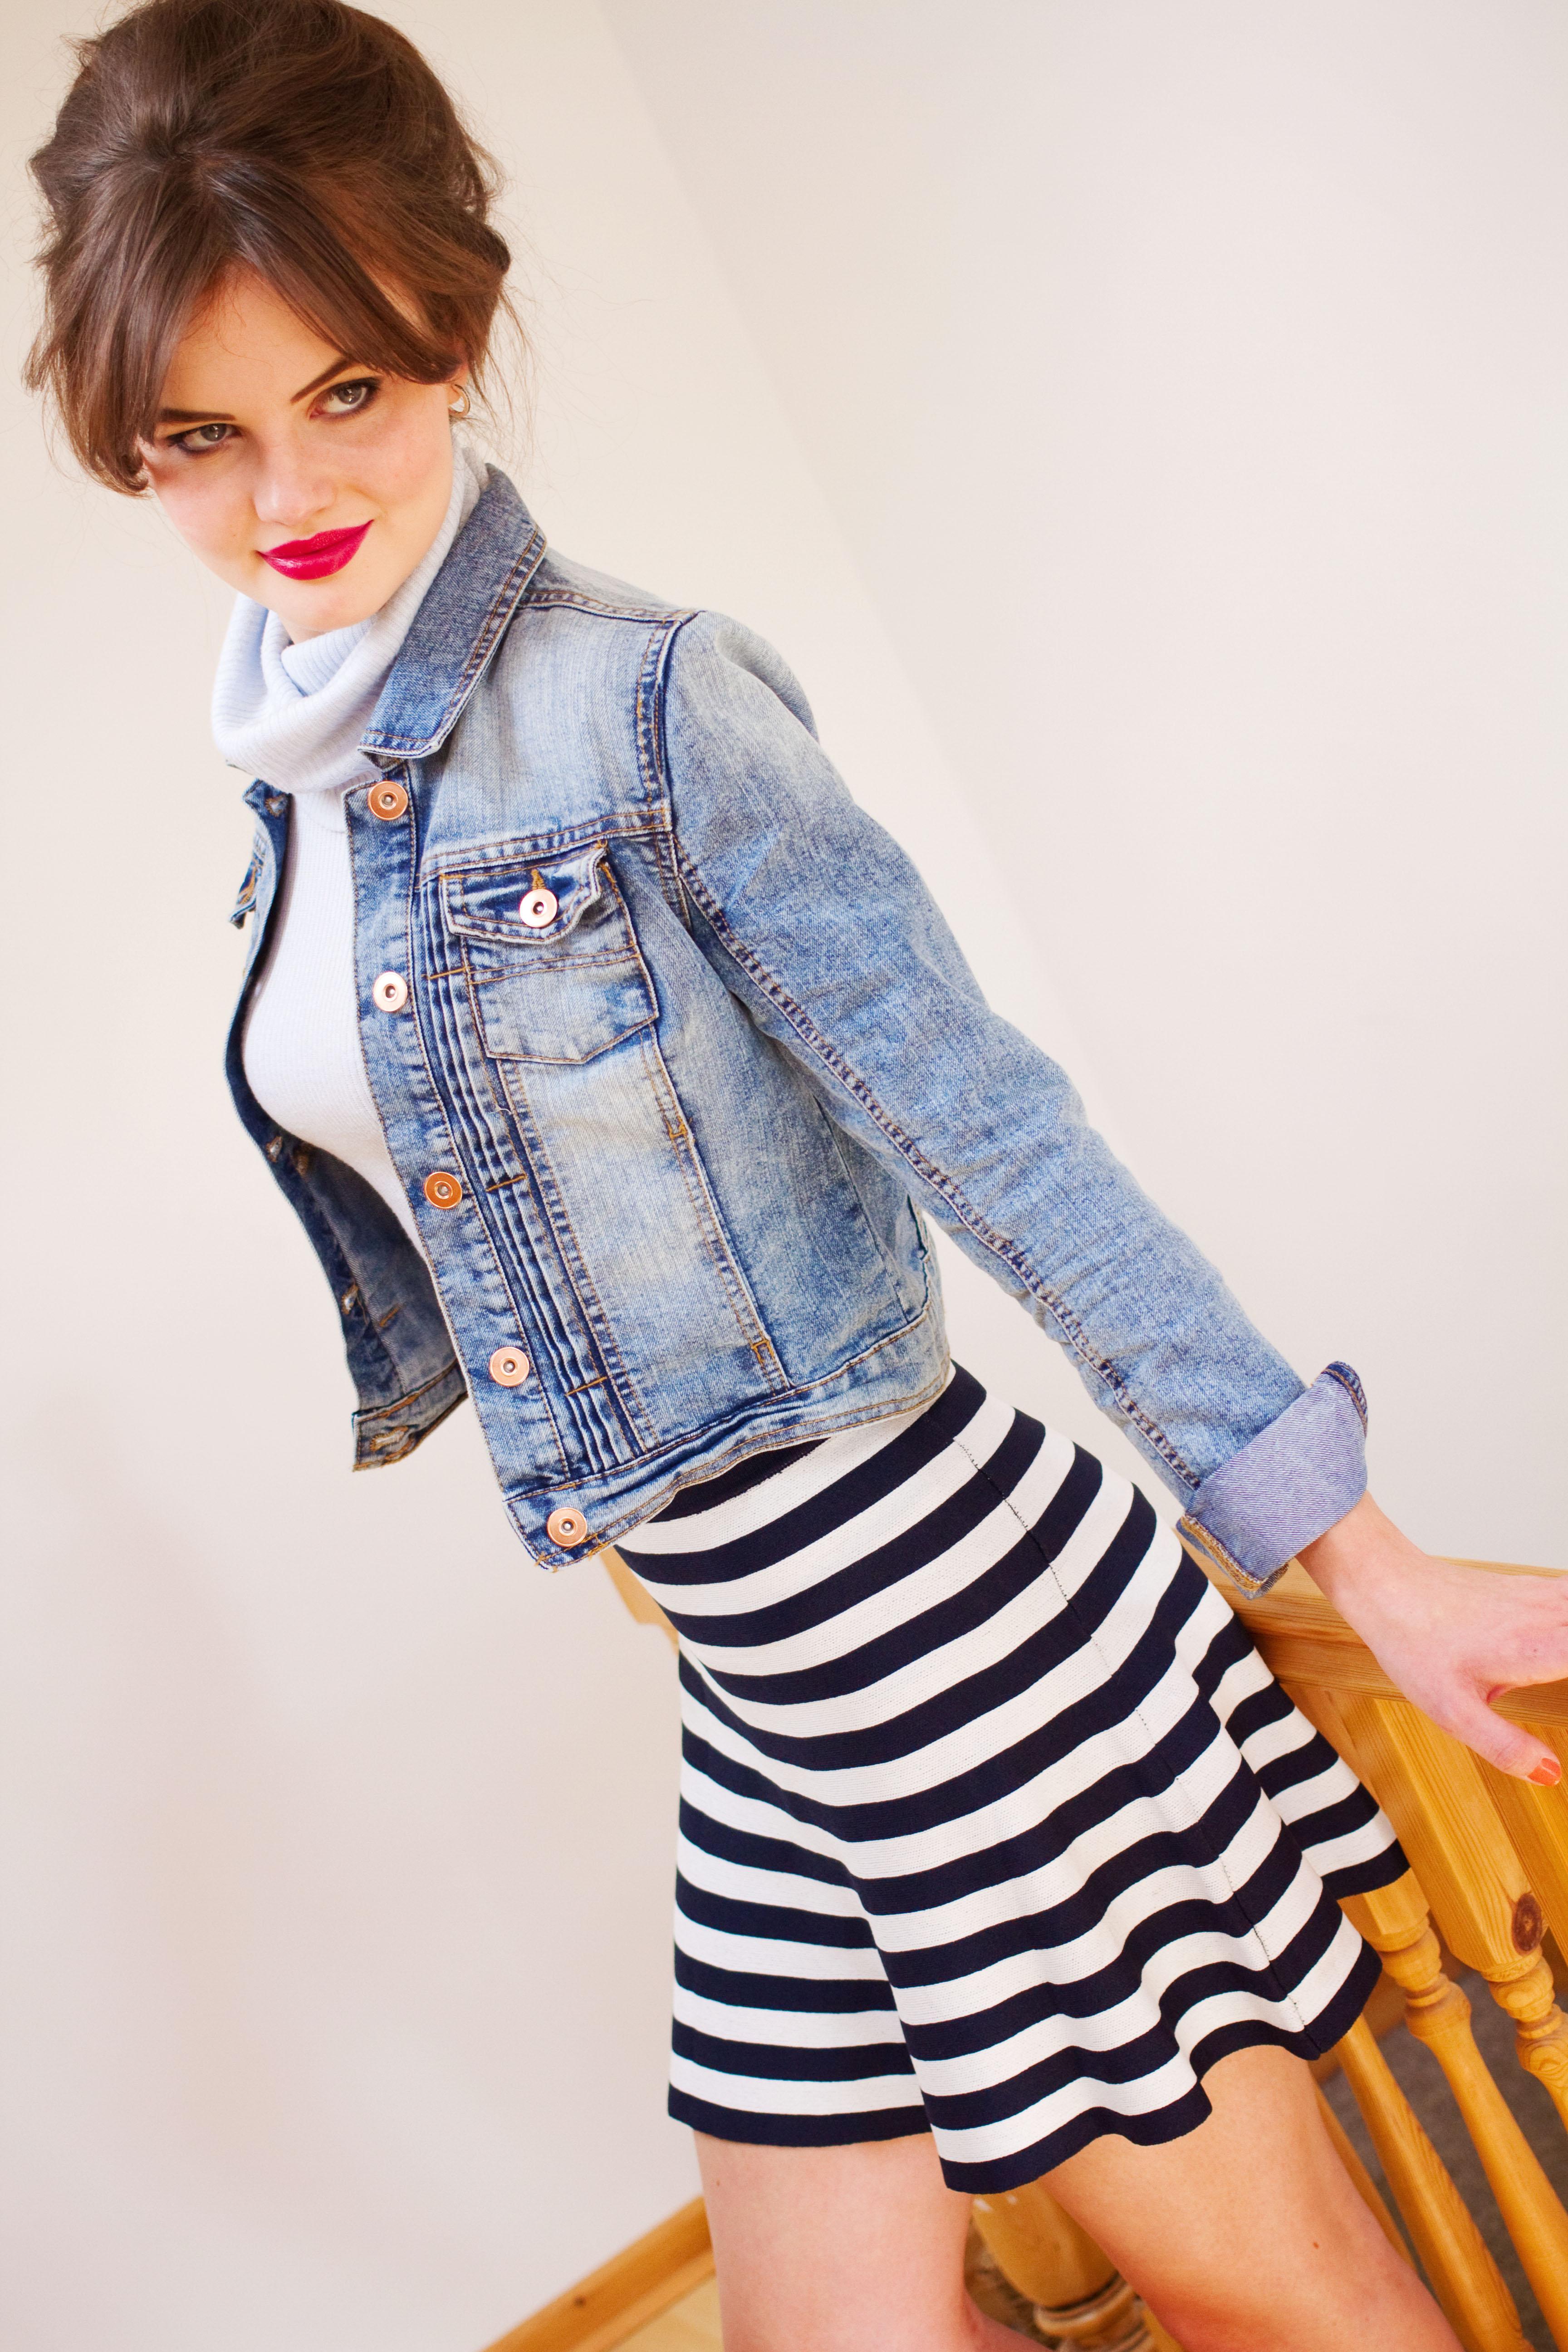 Cowl neck River Island Top. Primark striped flippy skirt. Denim jacket